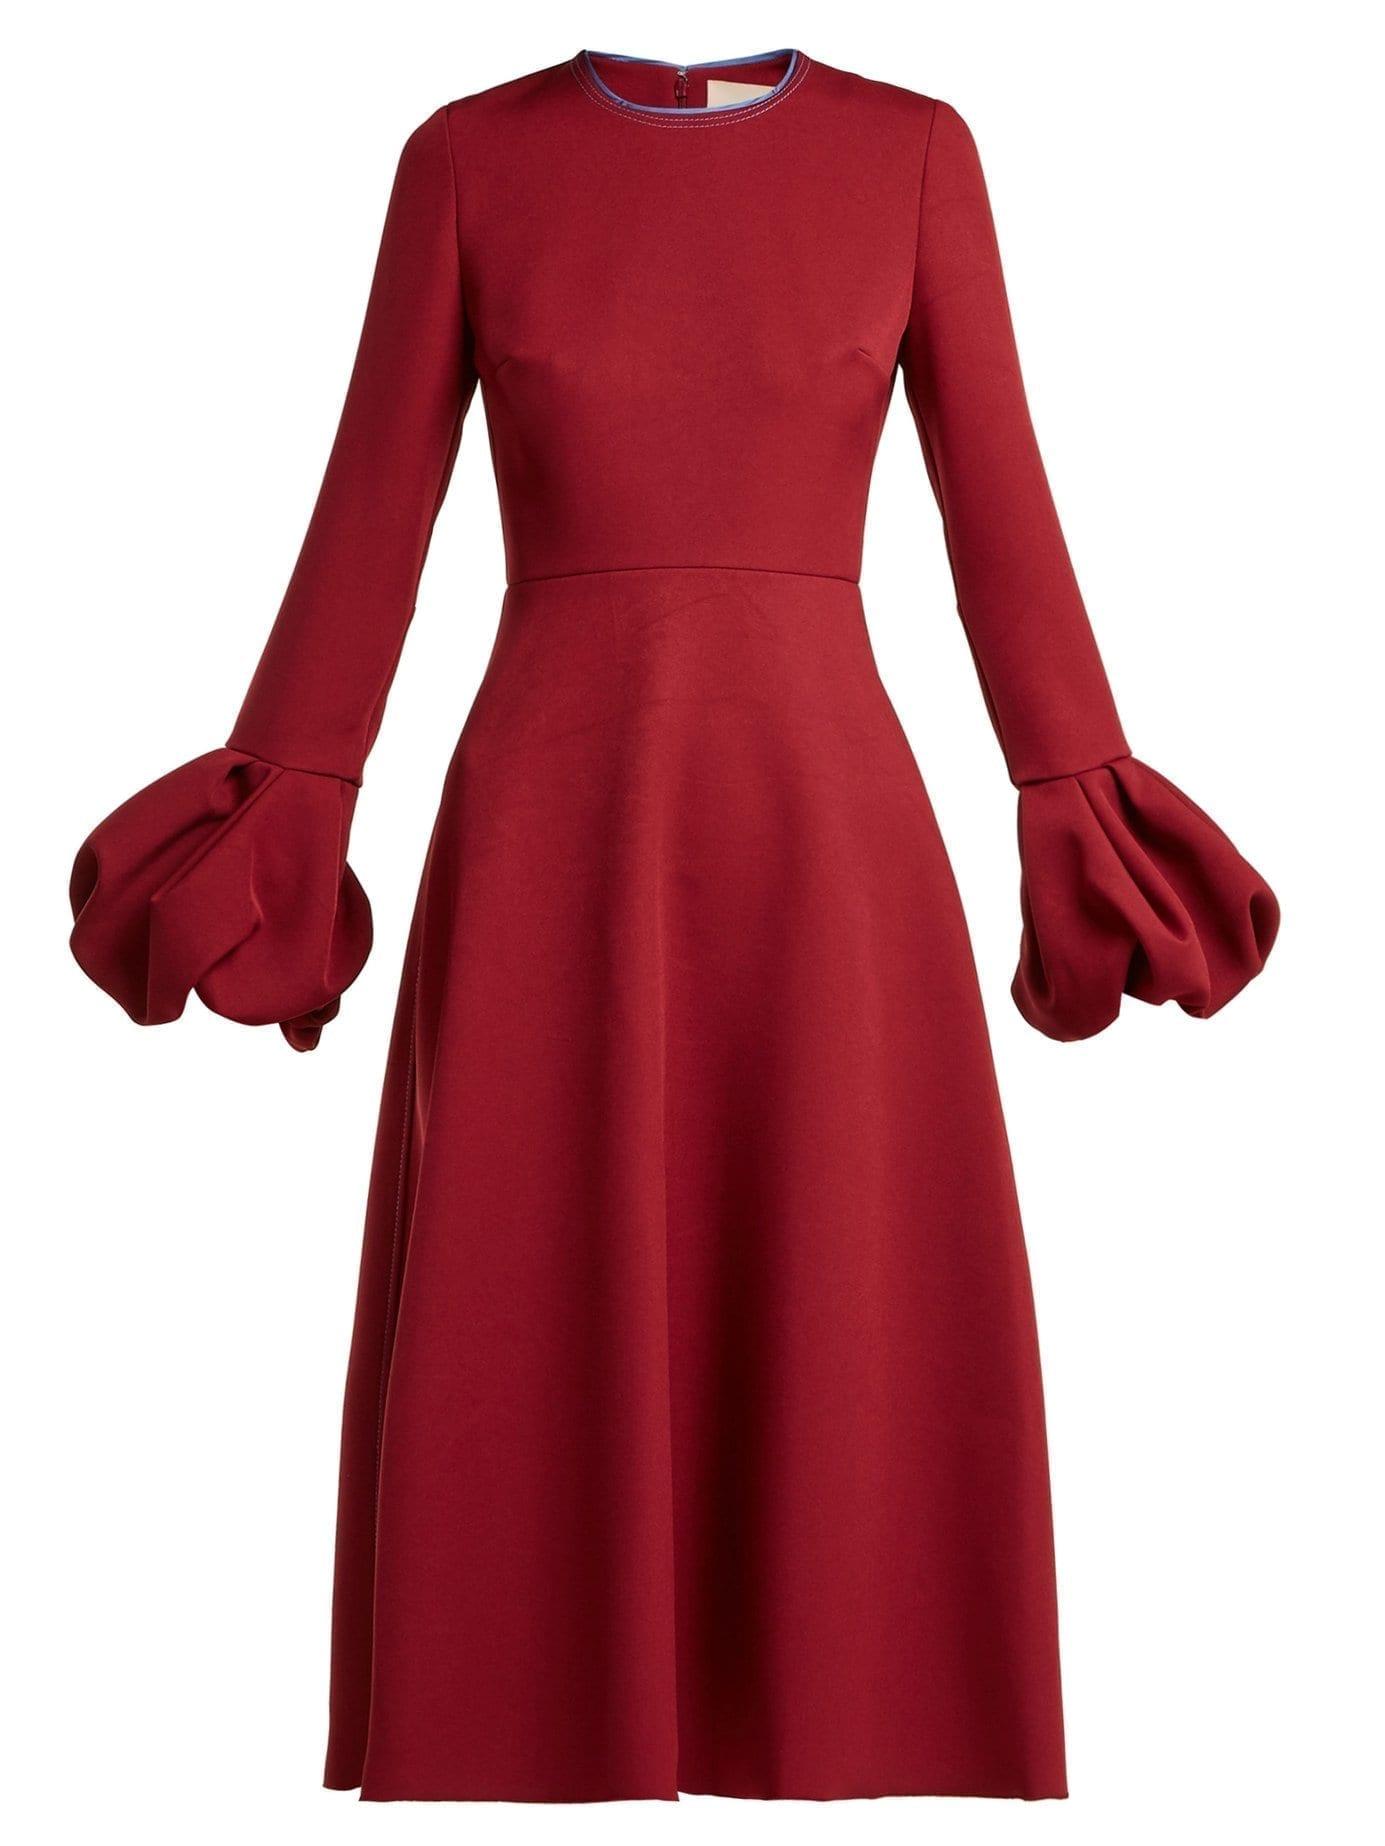 ROKSANDA Aylin Bell Sleeve Cady Burgundy Dress